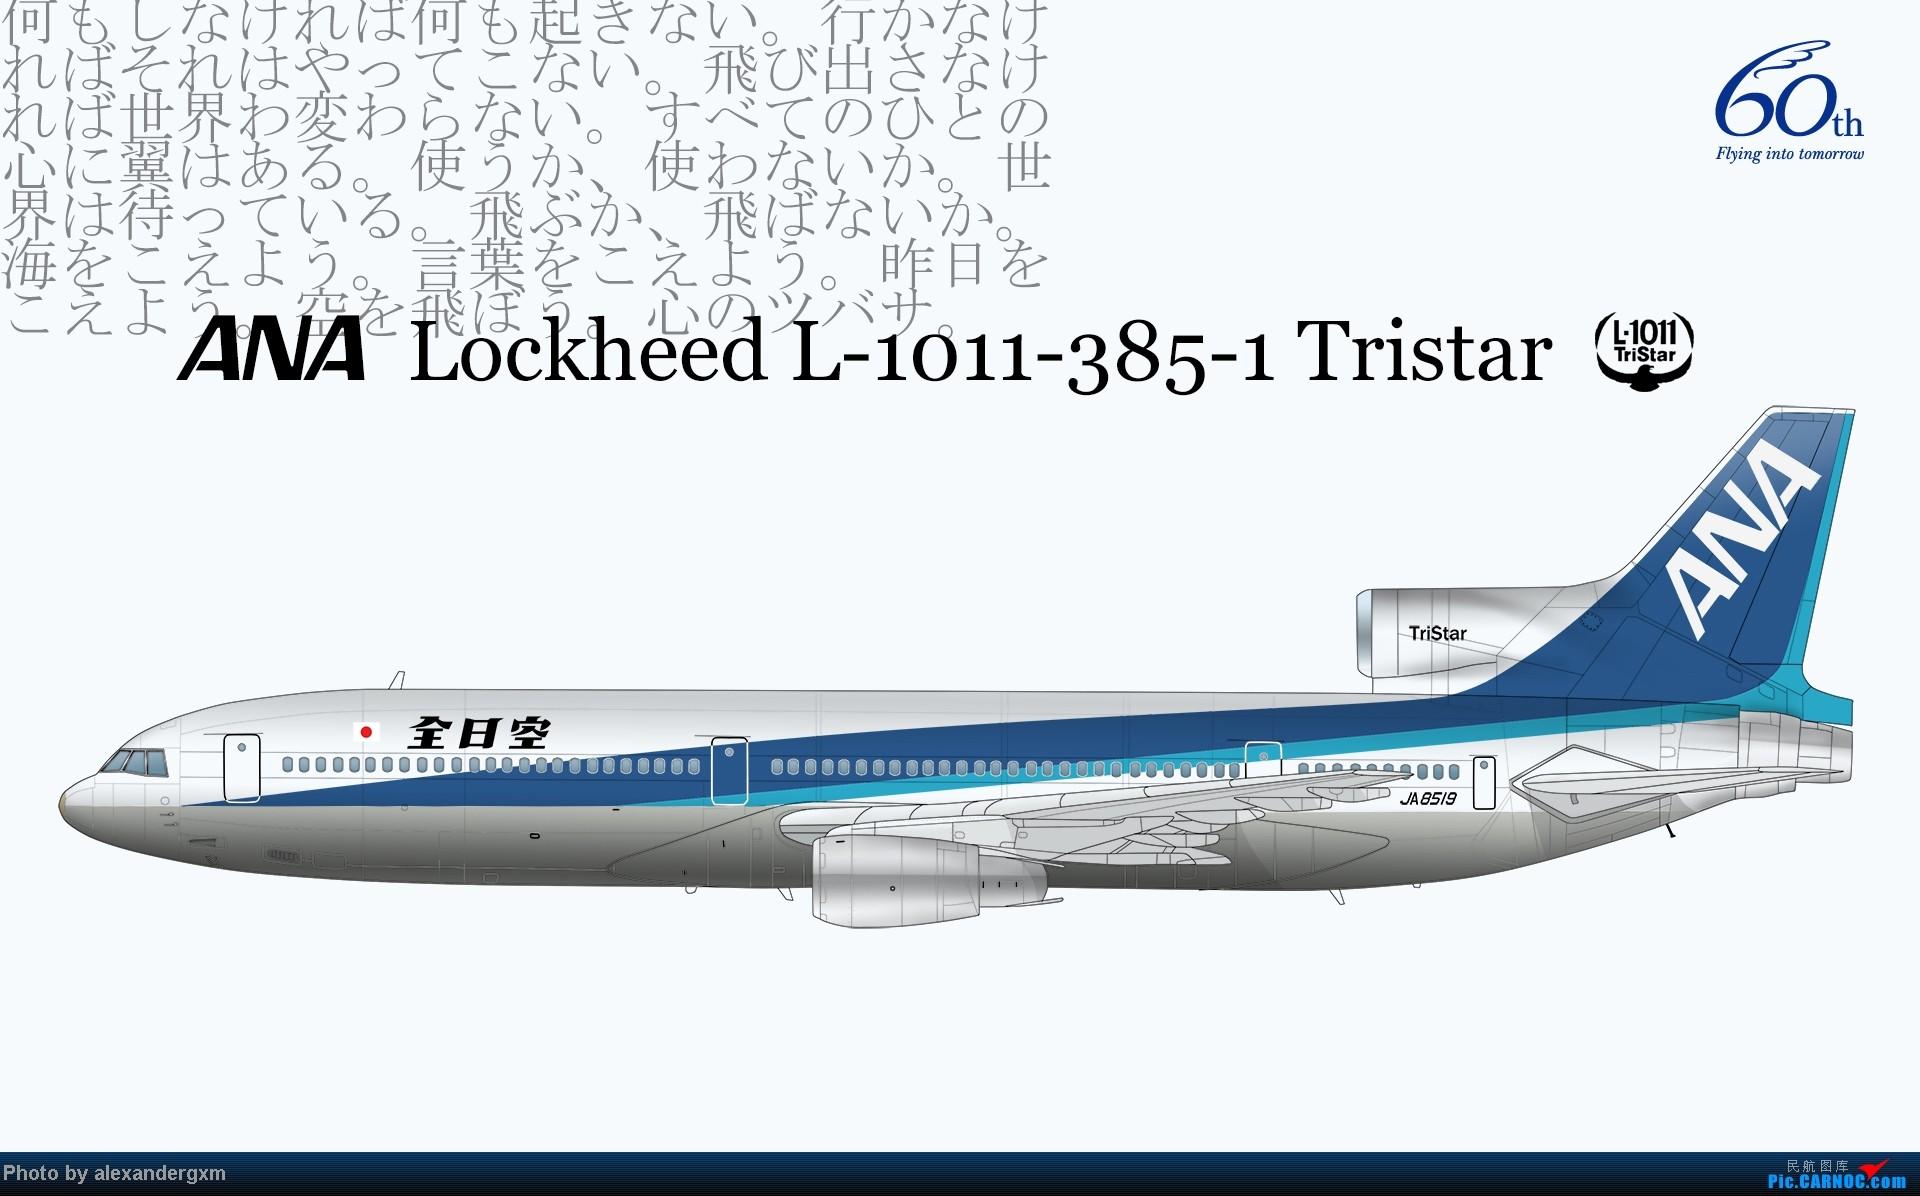 Re:[原创]发一些自己业余画的一些飞机啦~大部分侧视图~ L-1011-385-1